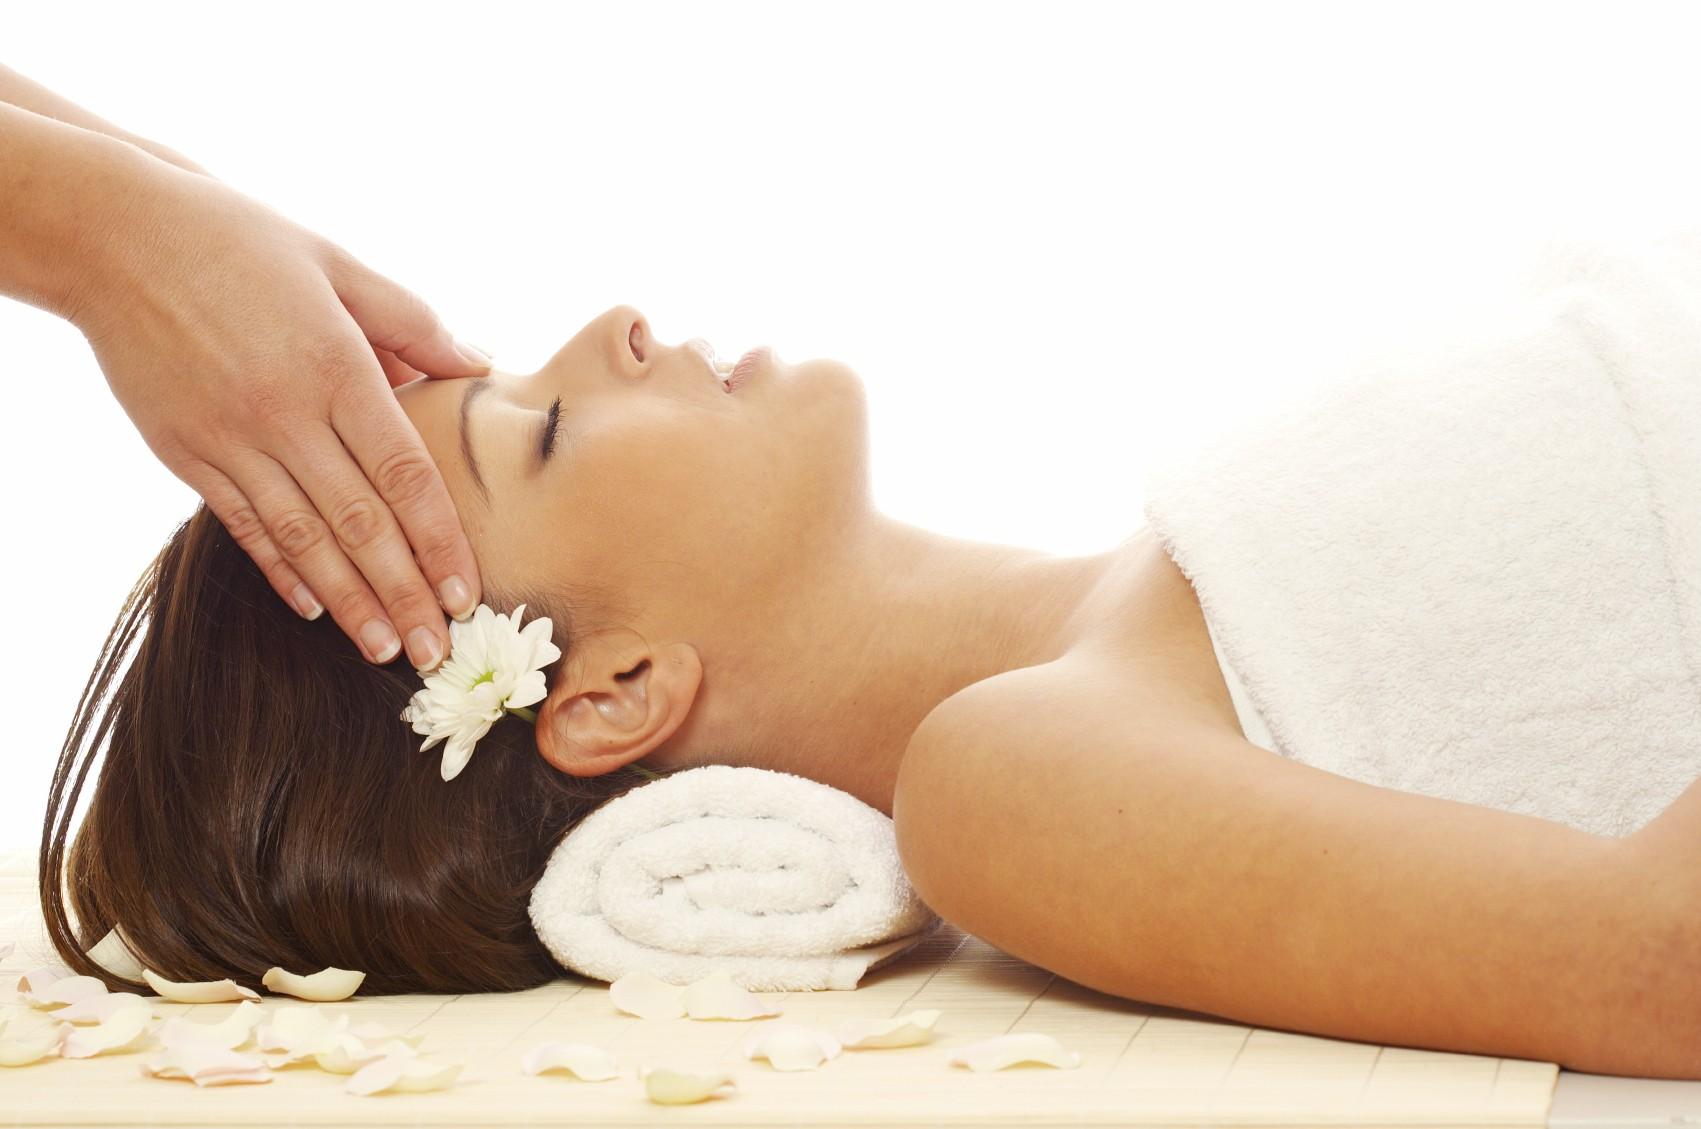 gratis-6se tantra massage i malmö